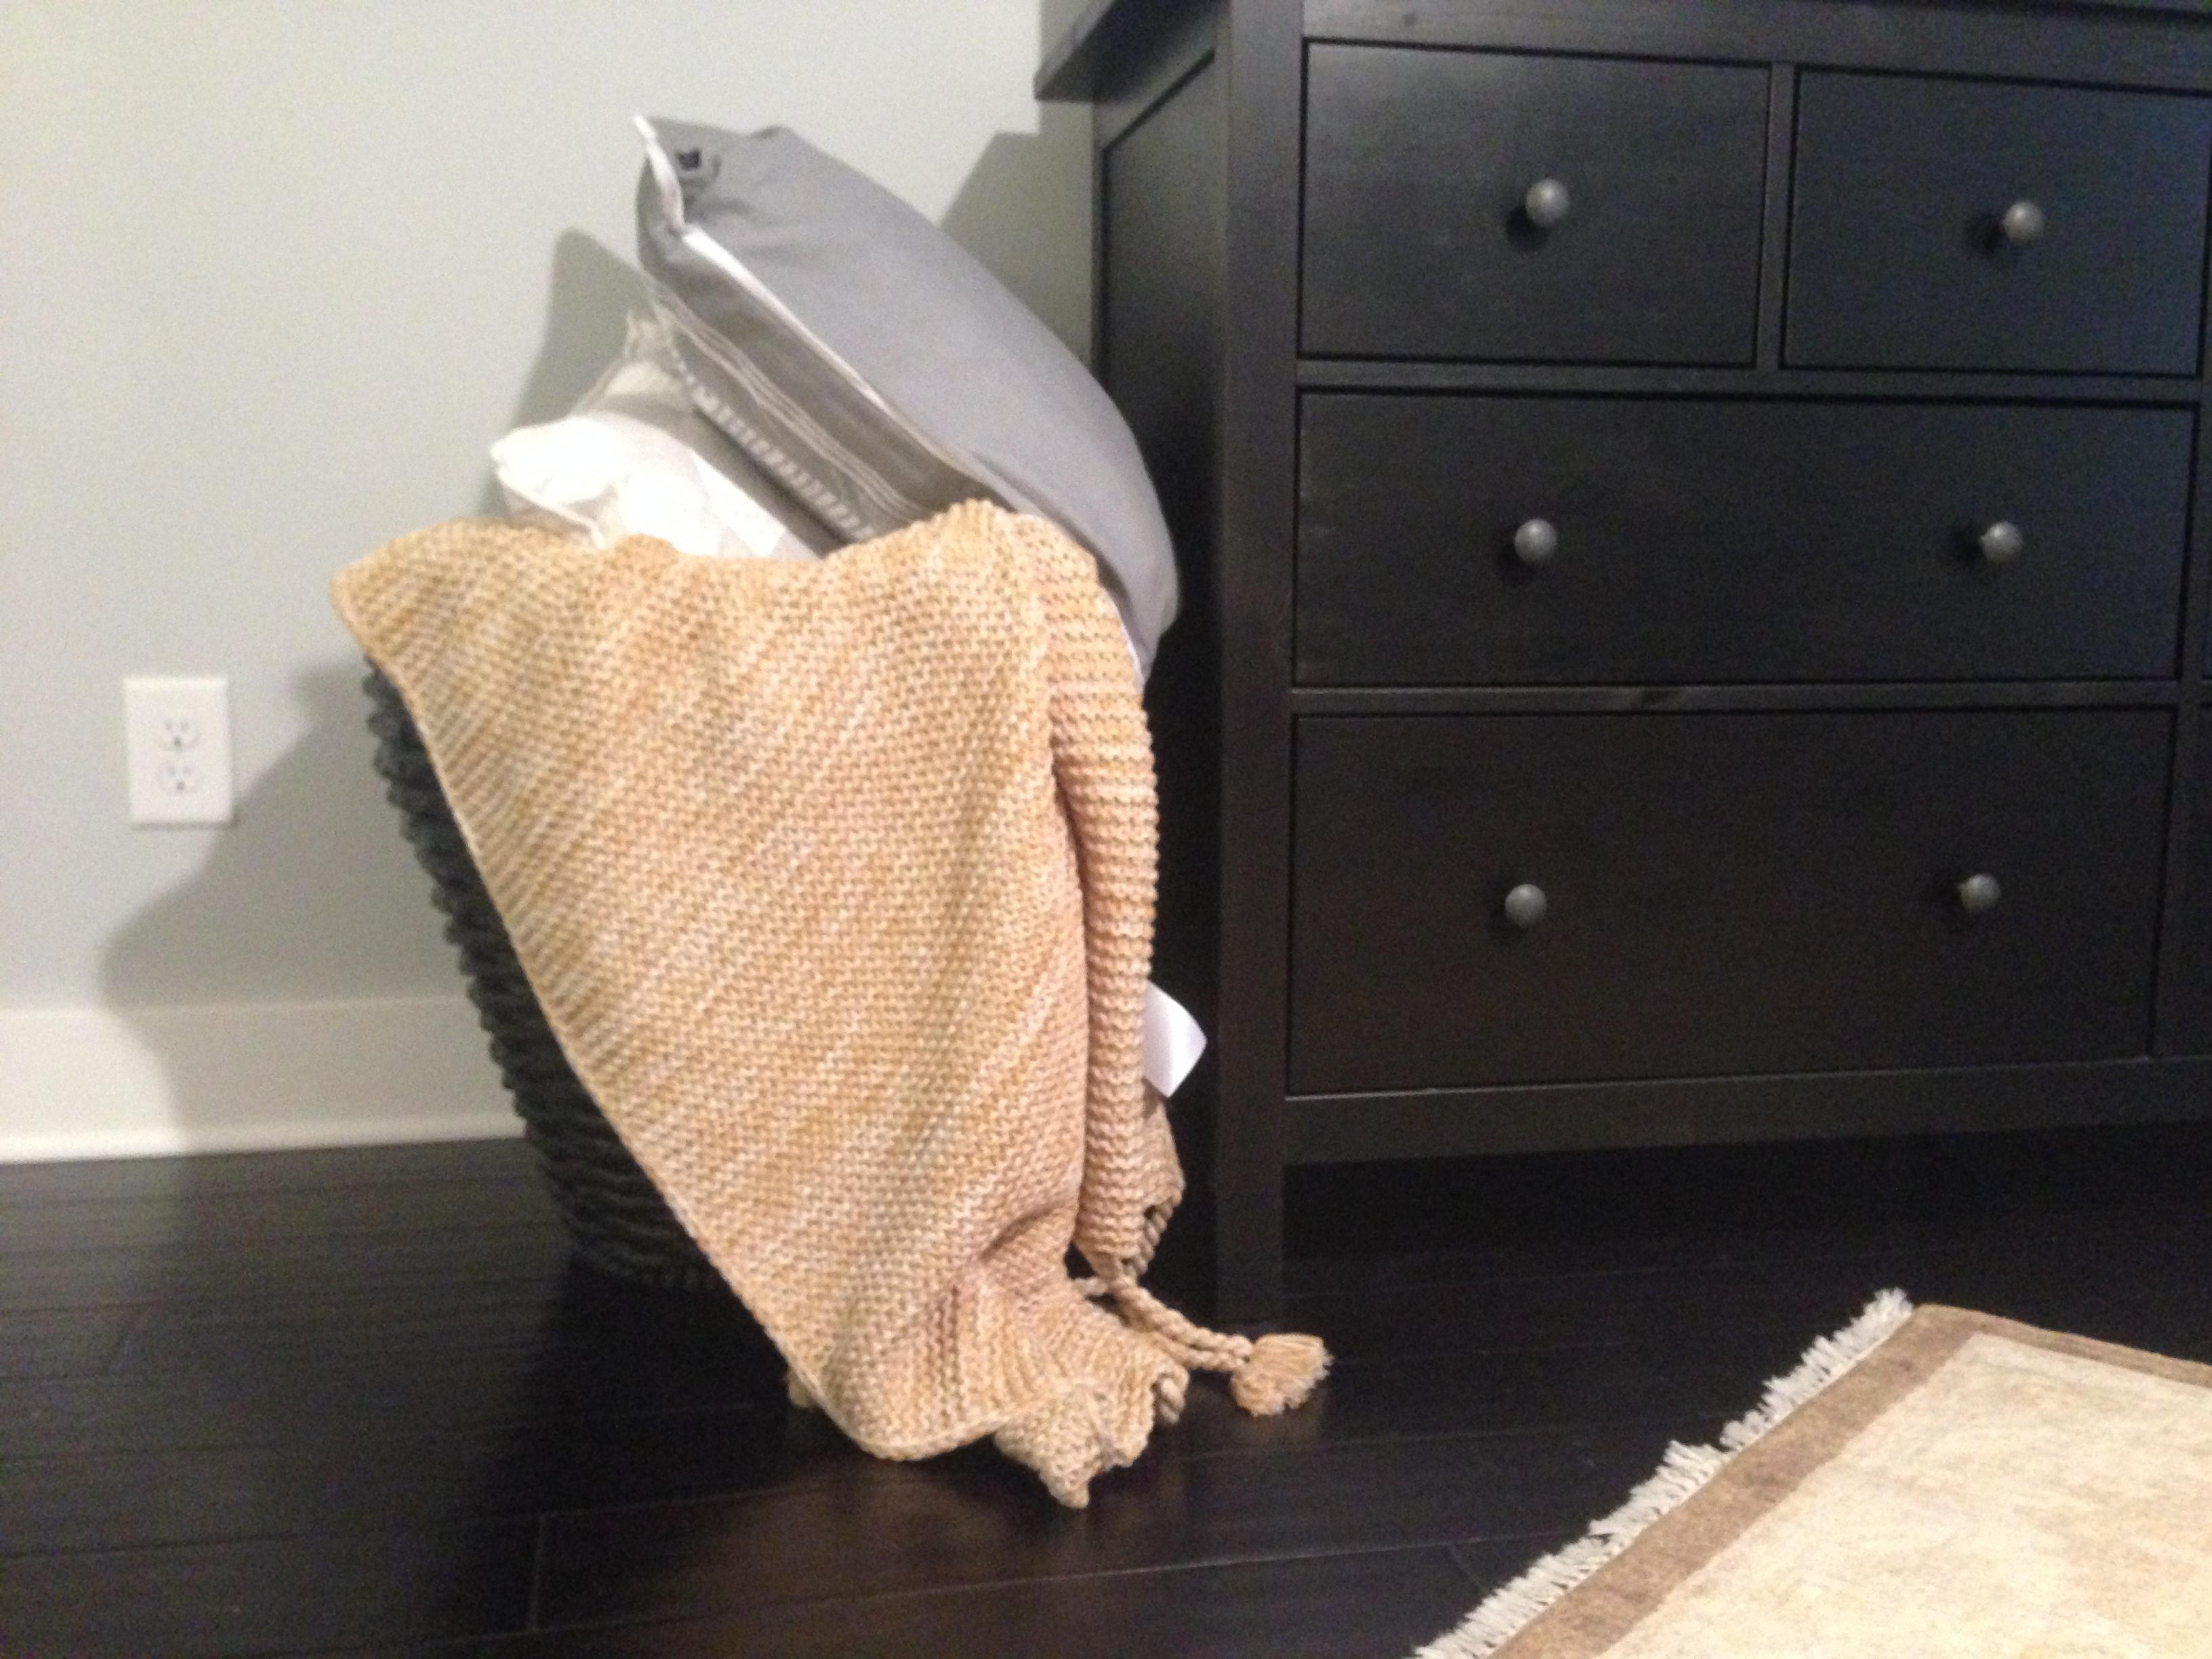 Bedroom Storage - Blankets